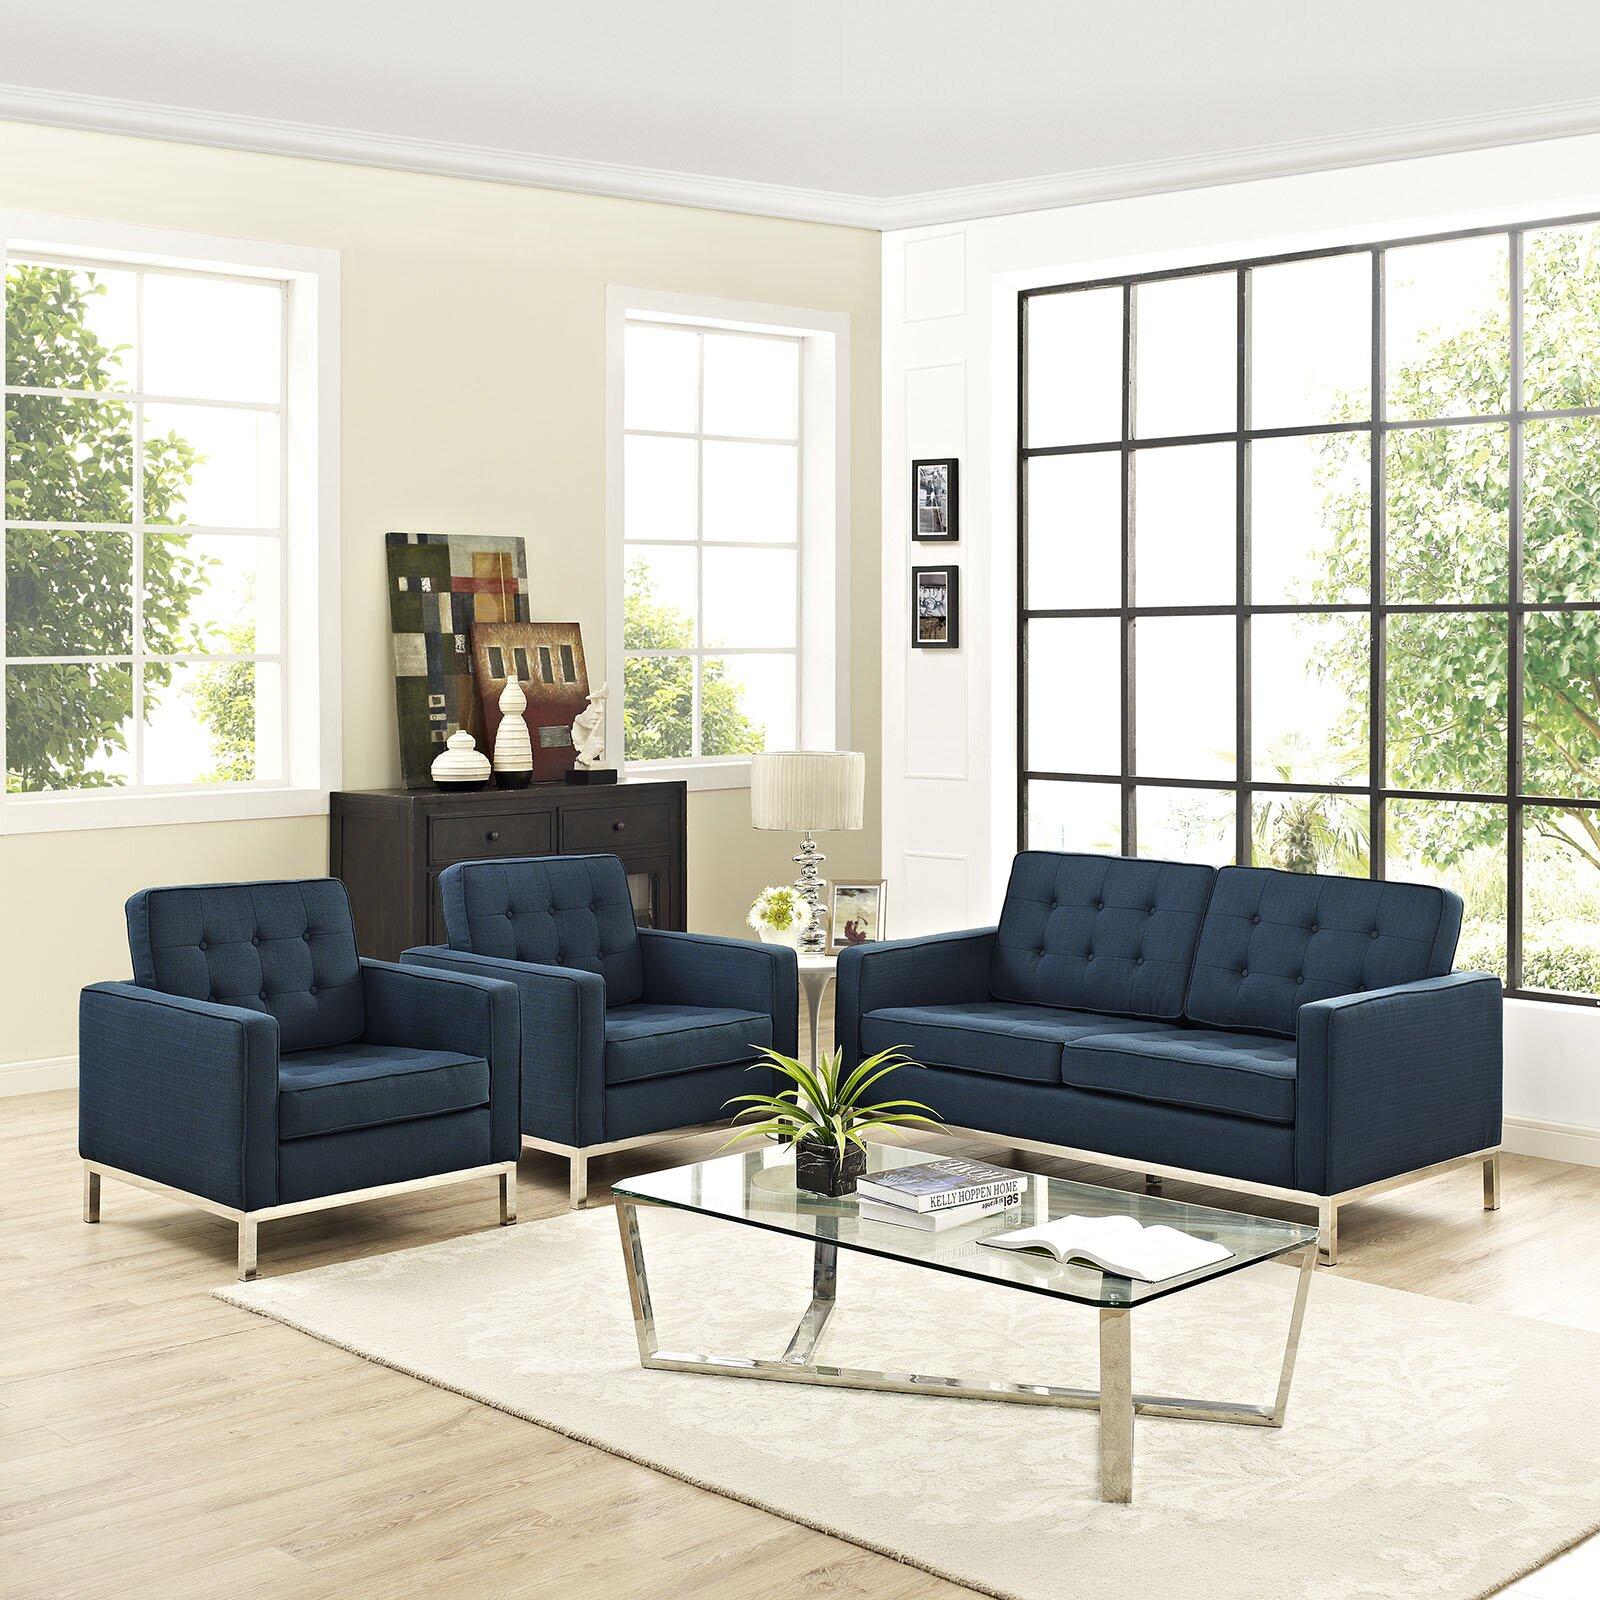 Modway loft 3 piece living room set wayfair for Three piece living room set